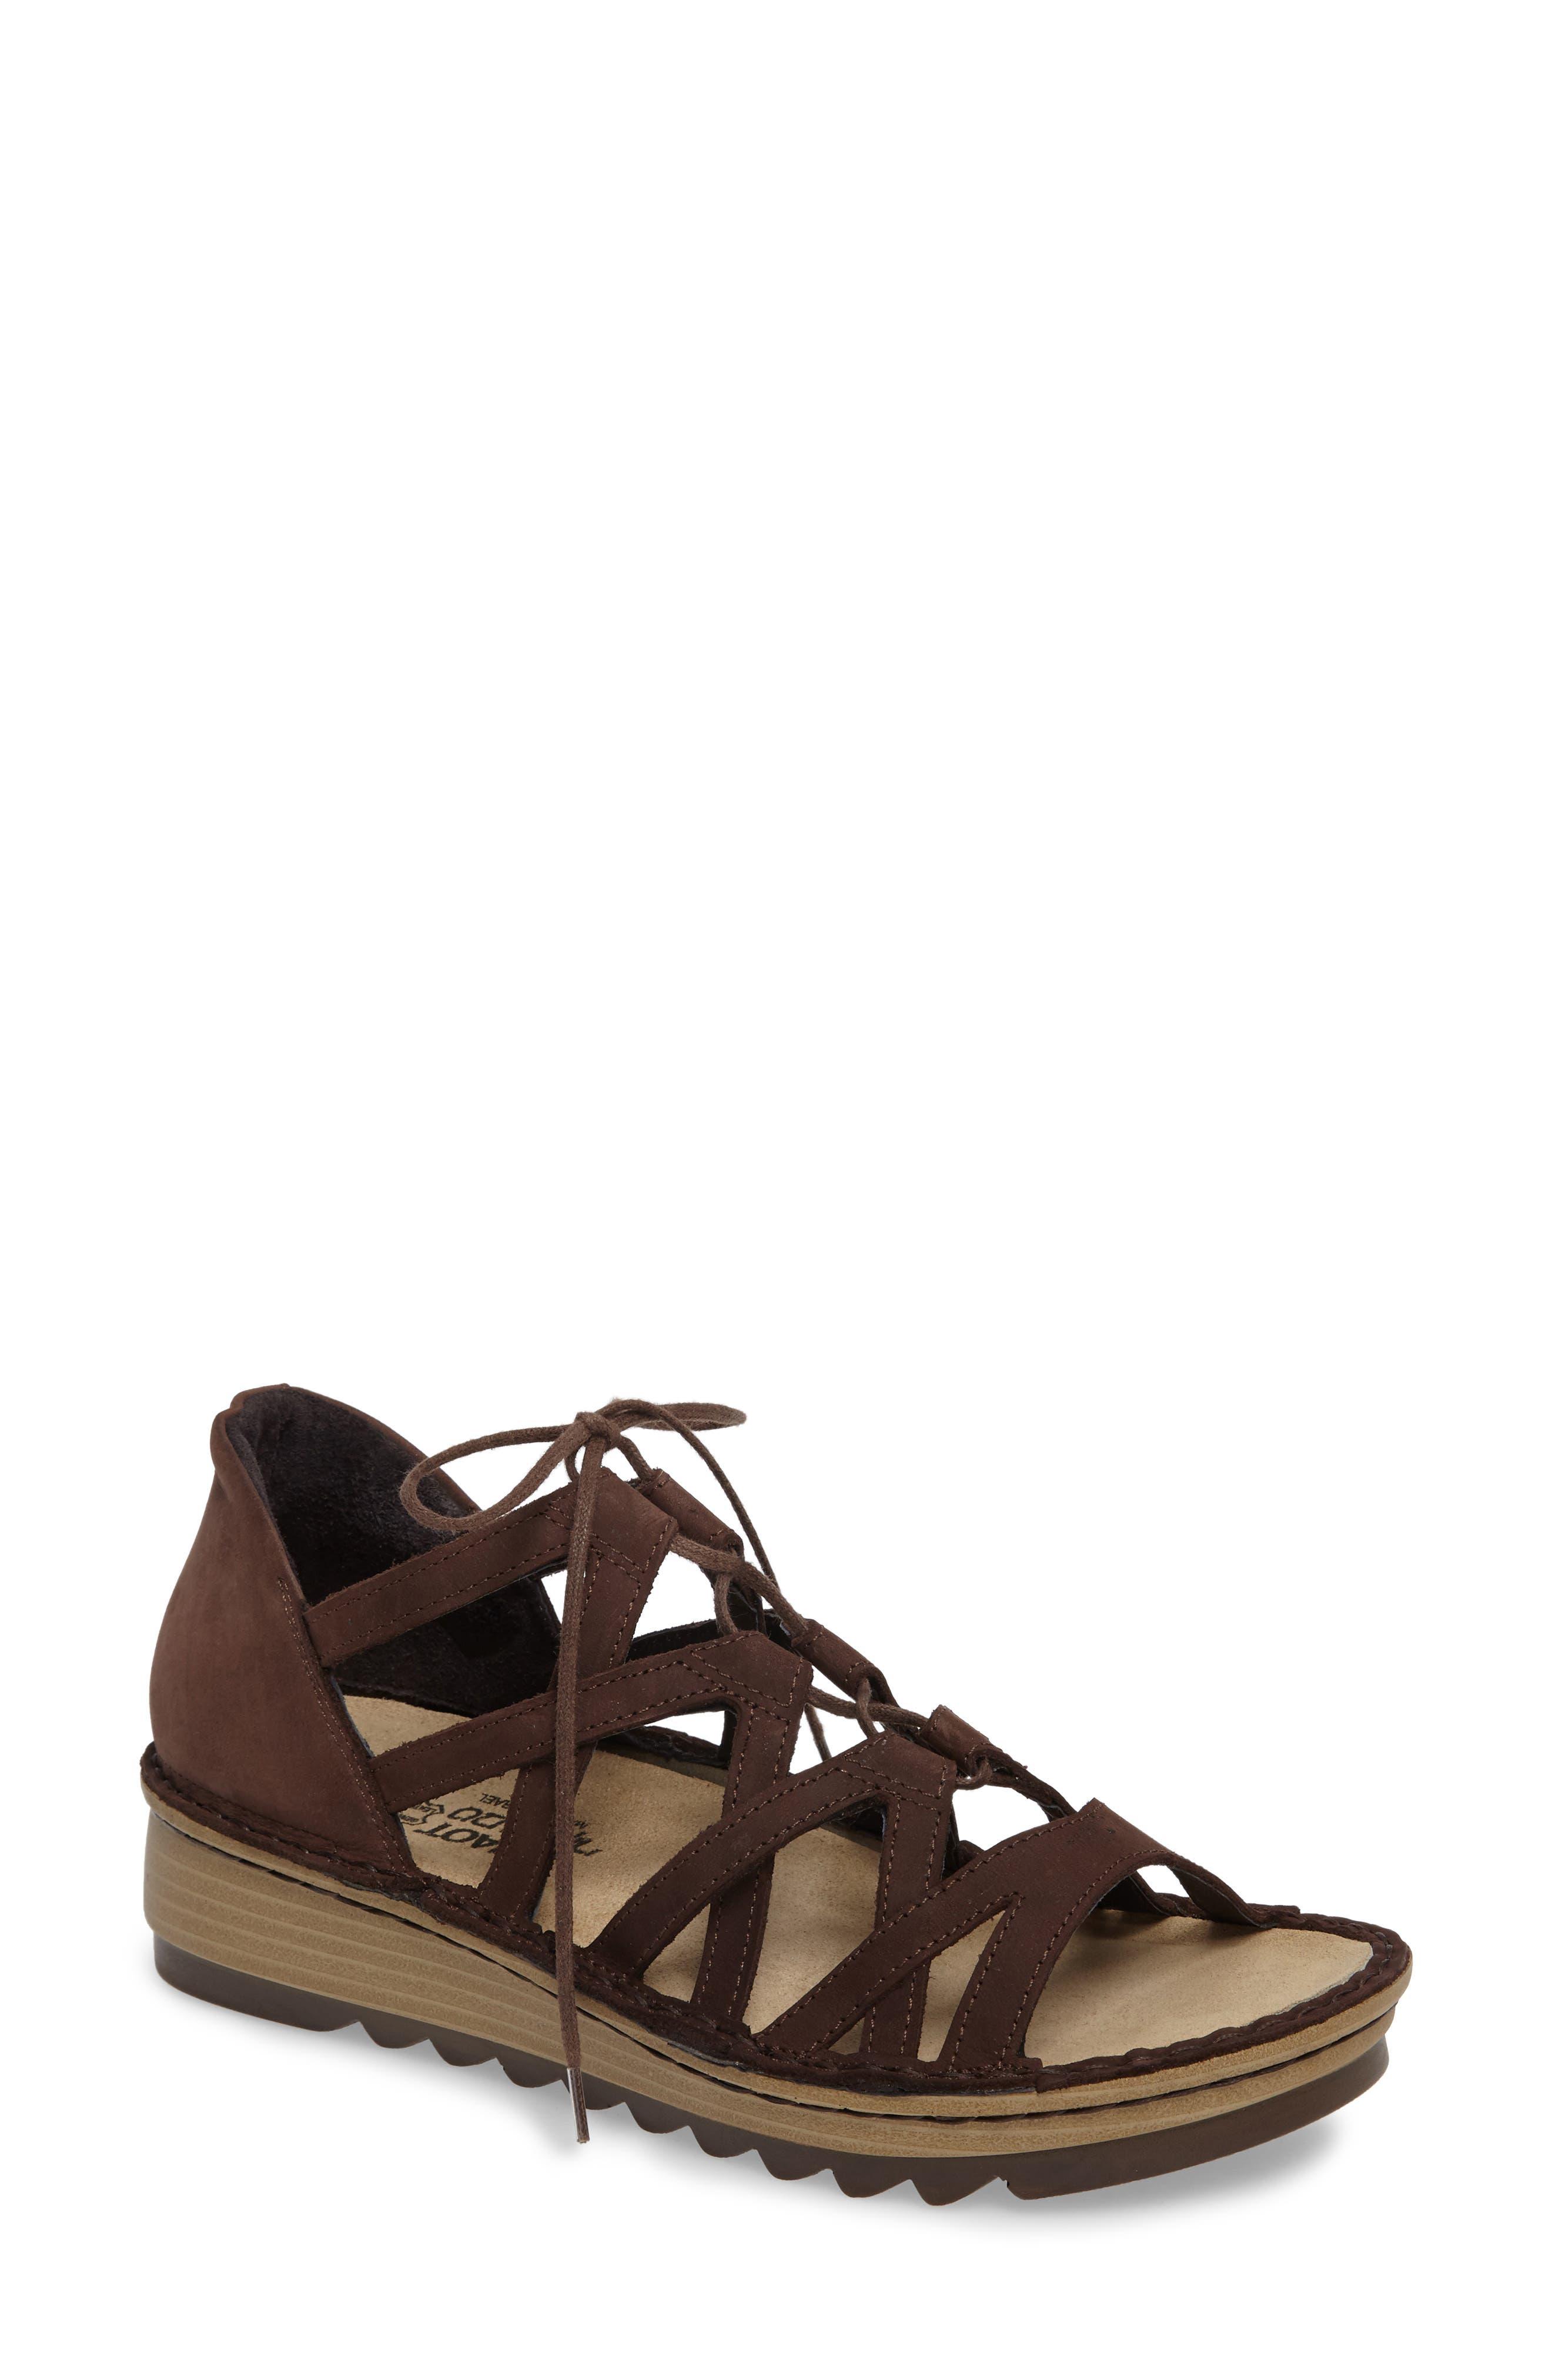 Alternate Image 1 Selected - Naot Yarrow Sandal (Women)